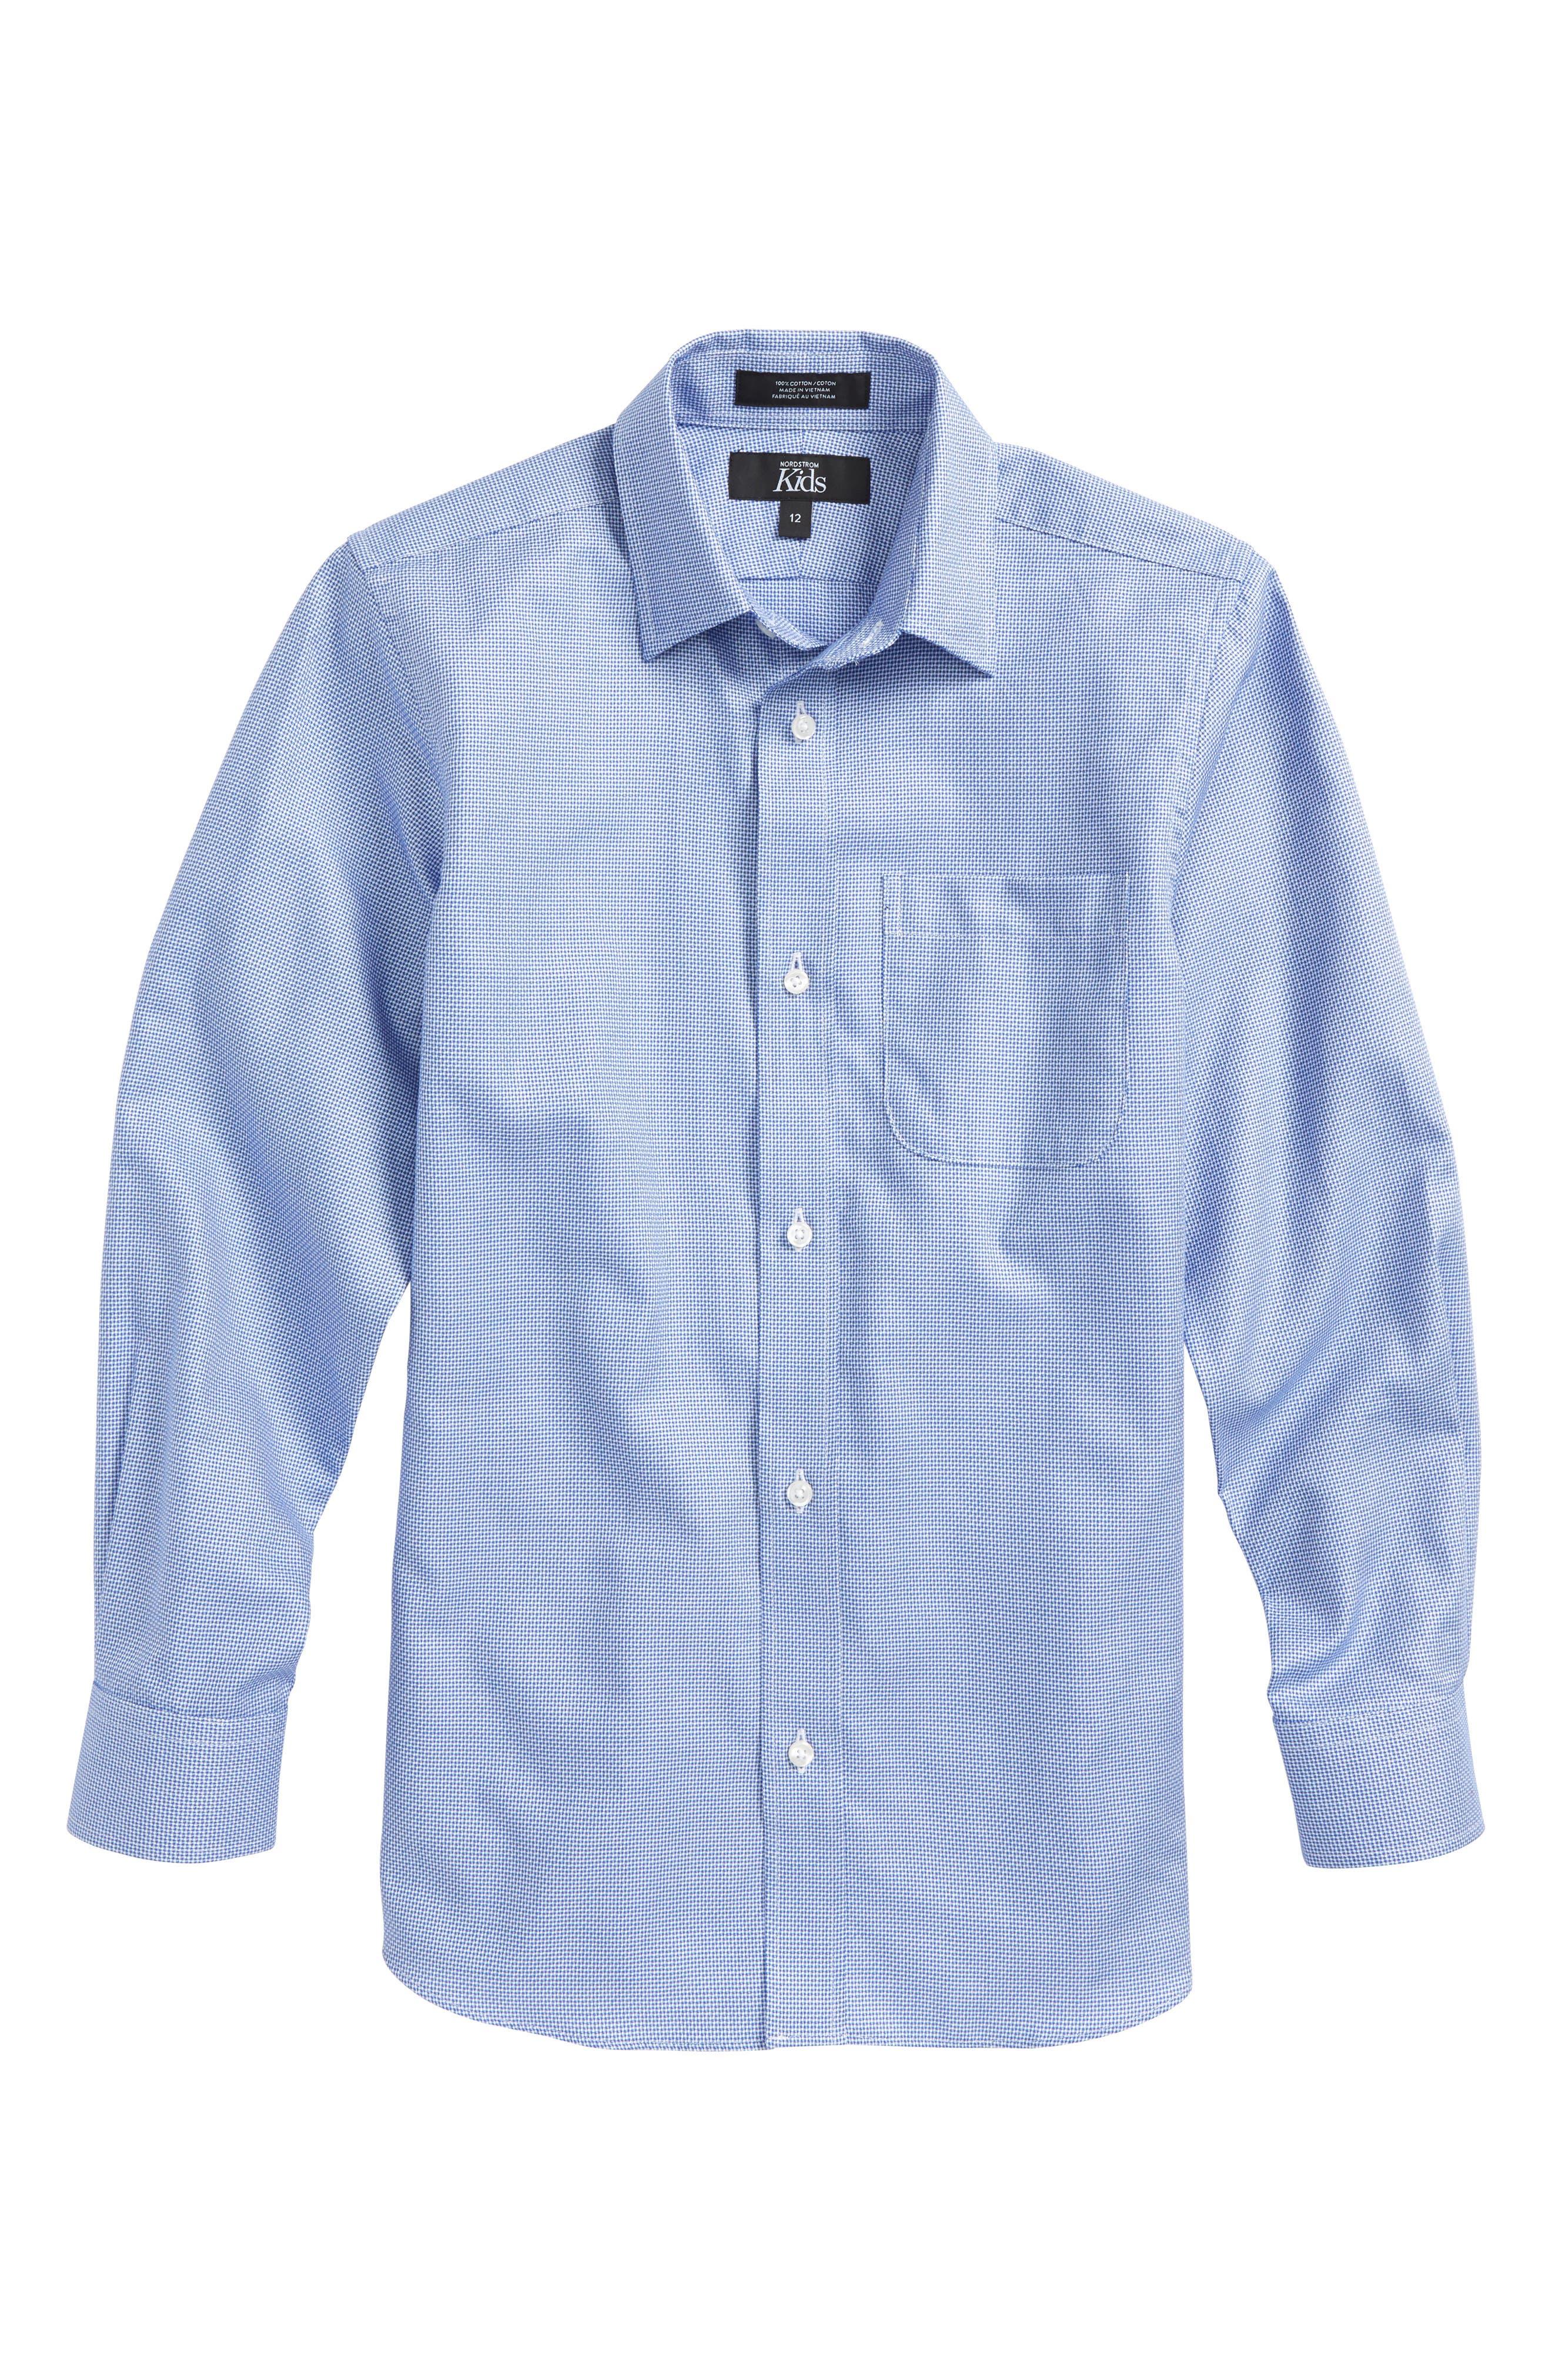 Sodalite Dobby Sport Shirt,                             Main thumbnail 1, color,                             420